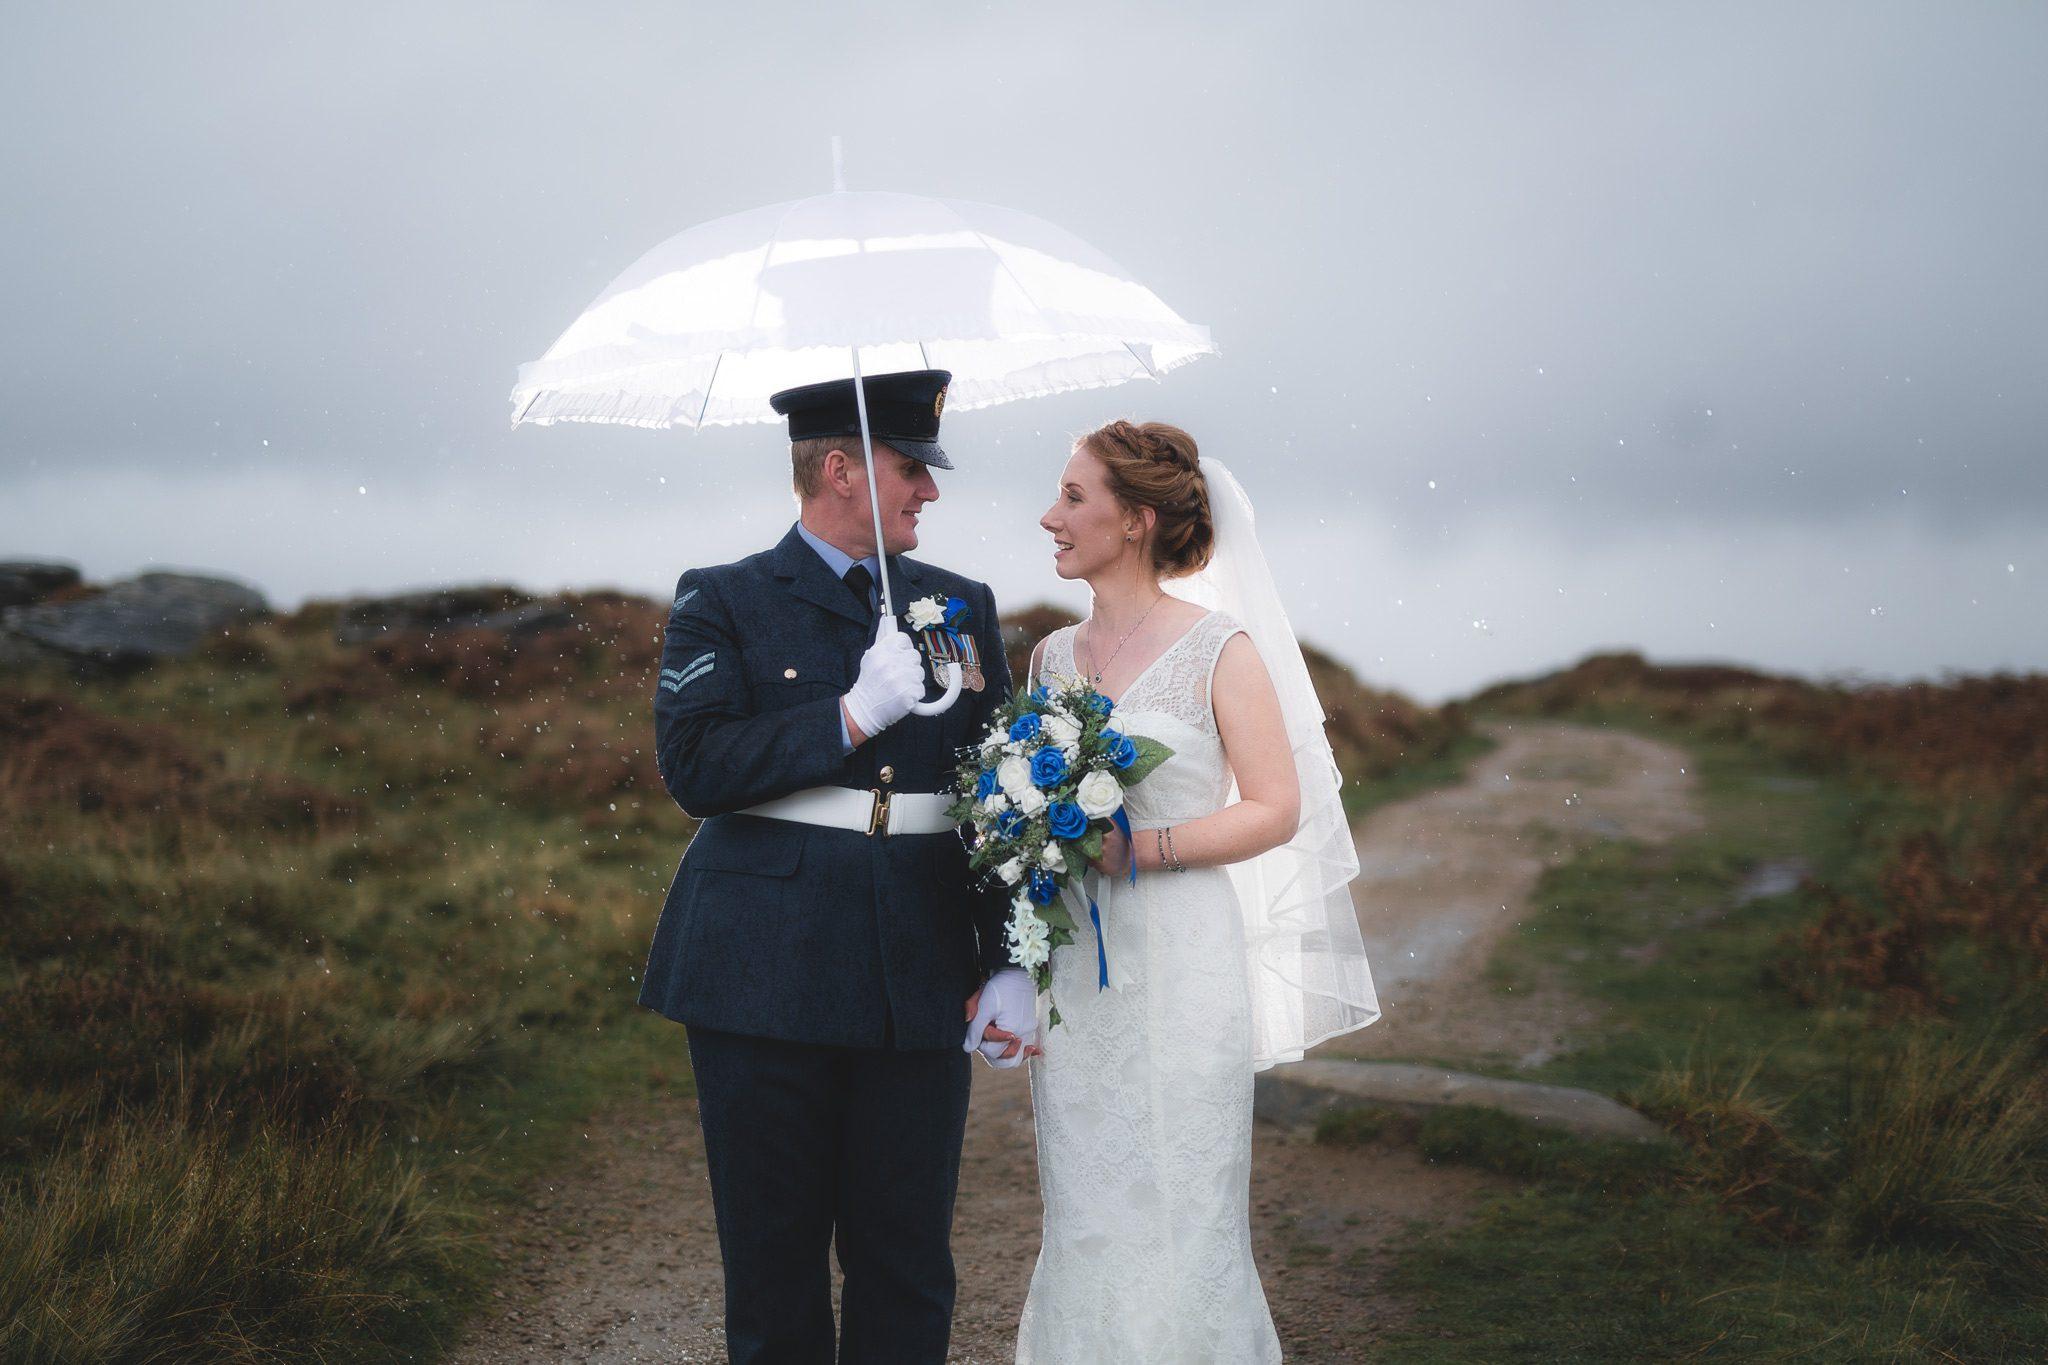 Peak District Wedding Photographer - Curbar Edge